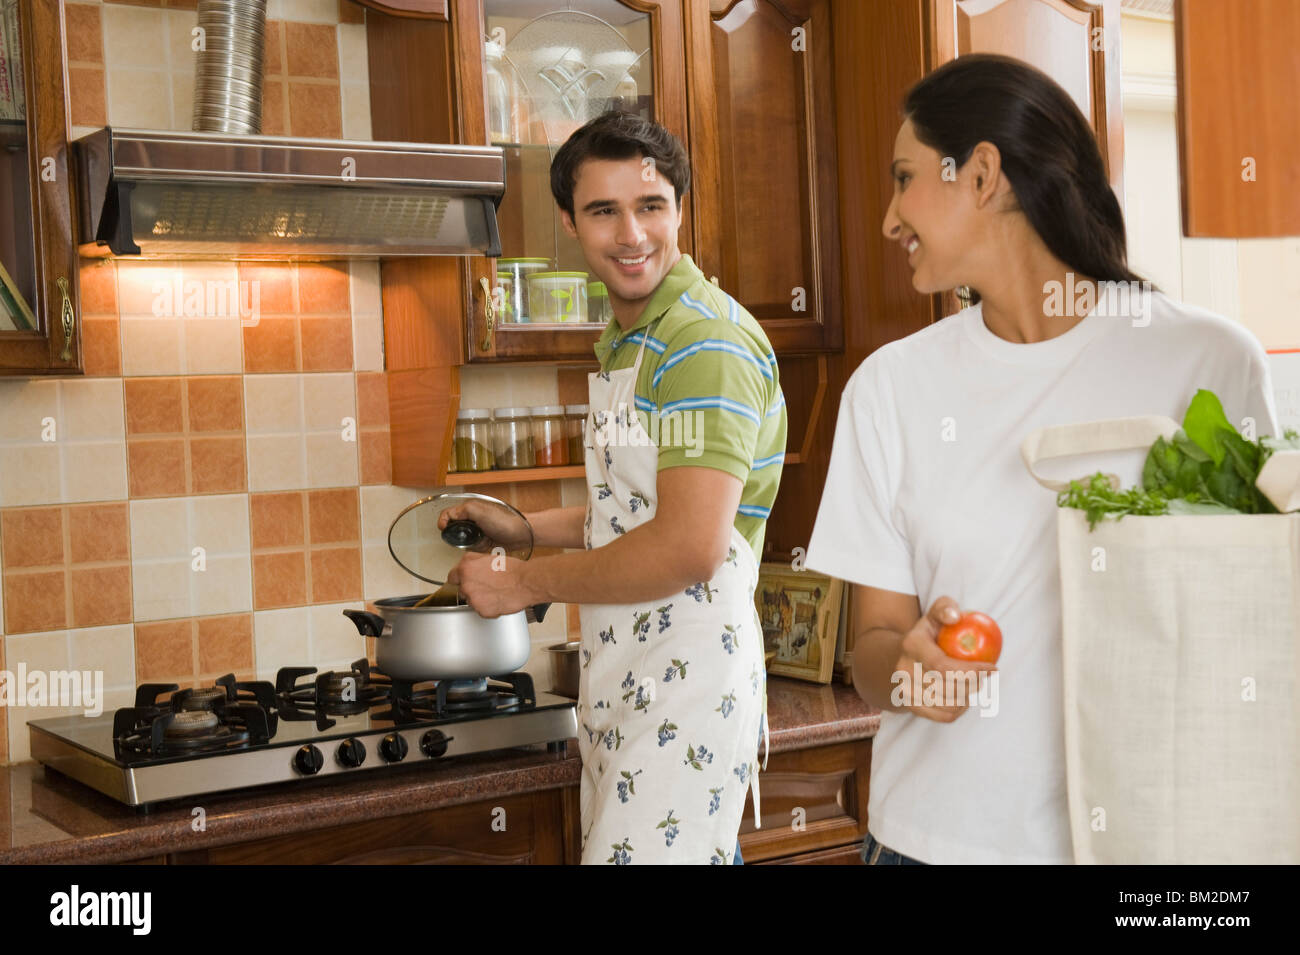 Indian Wife Preparing Food Stock Photos Indian Wife Preparing